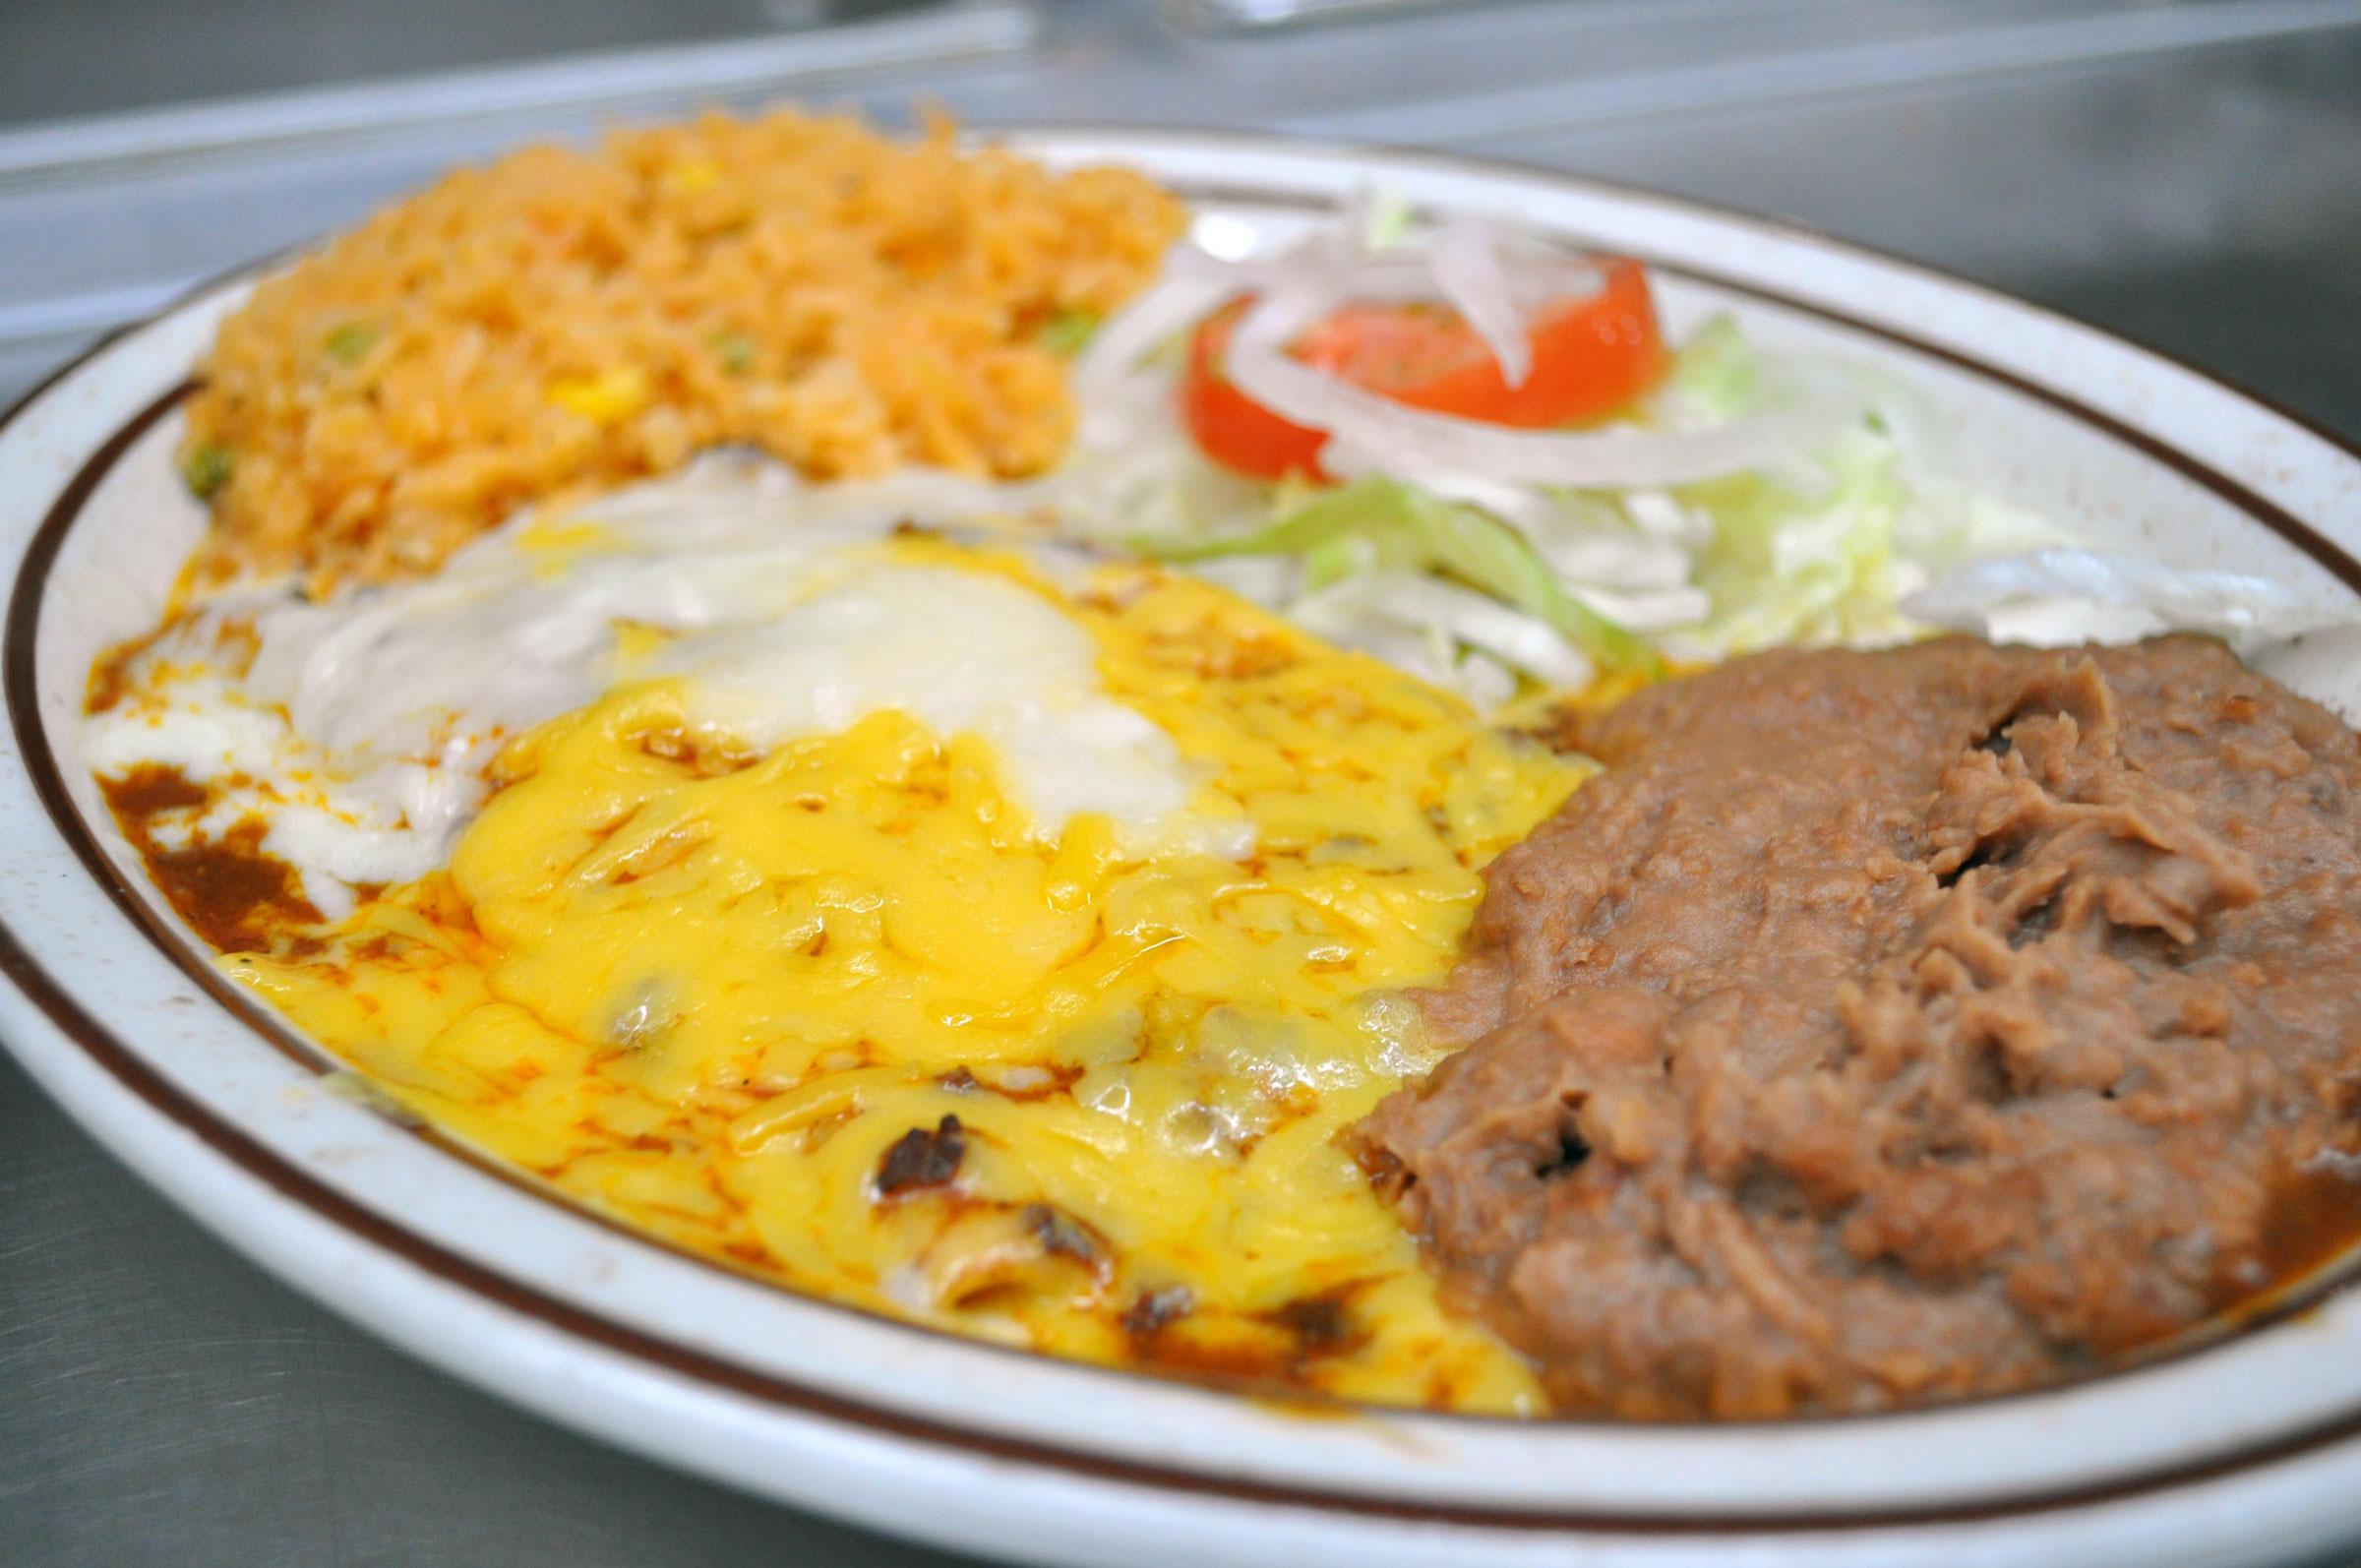 Tampio-web-menu-enchiladas.jpg